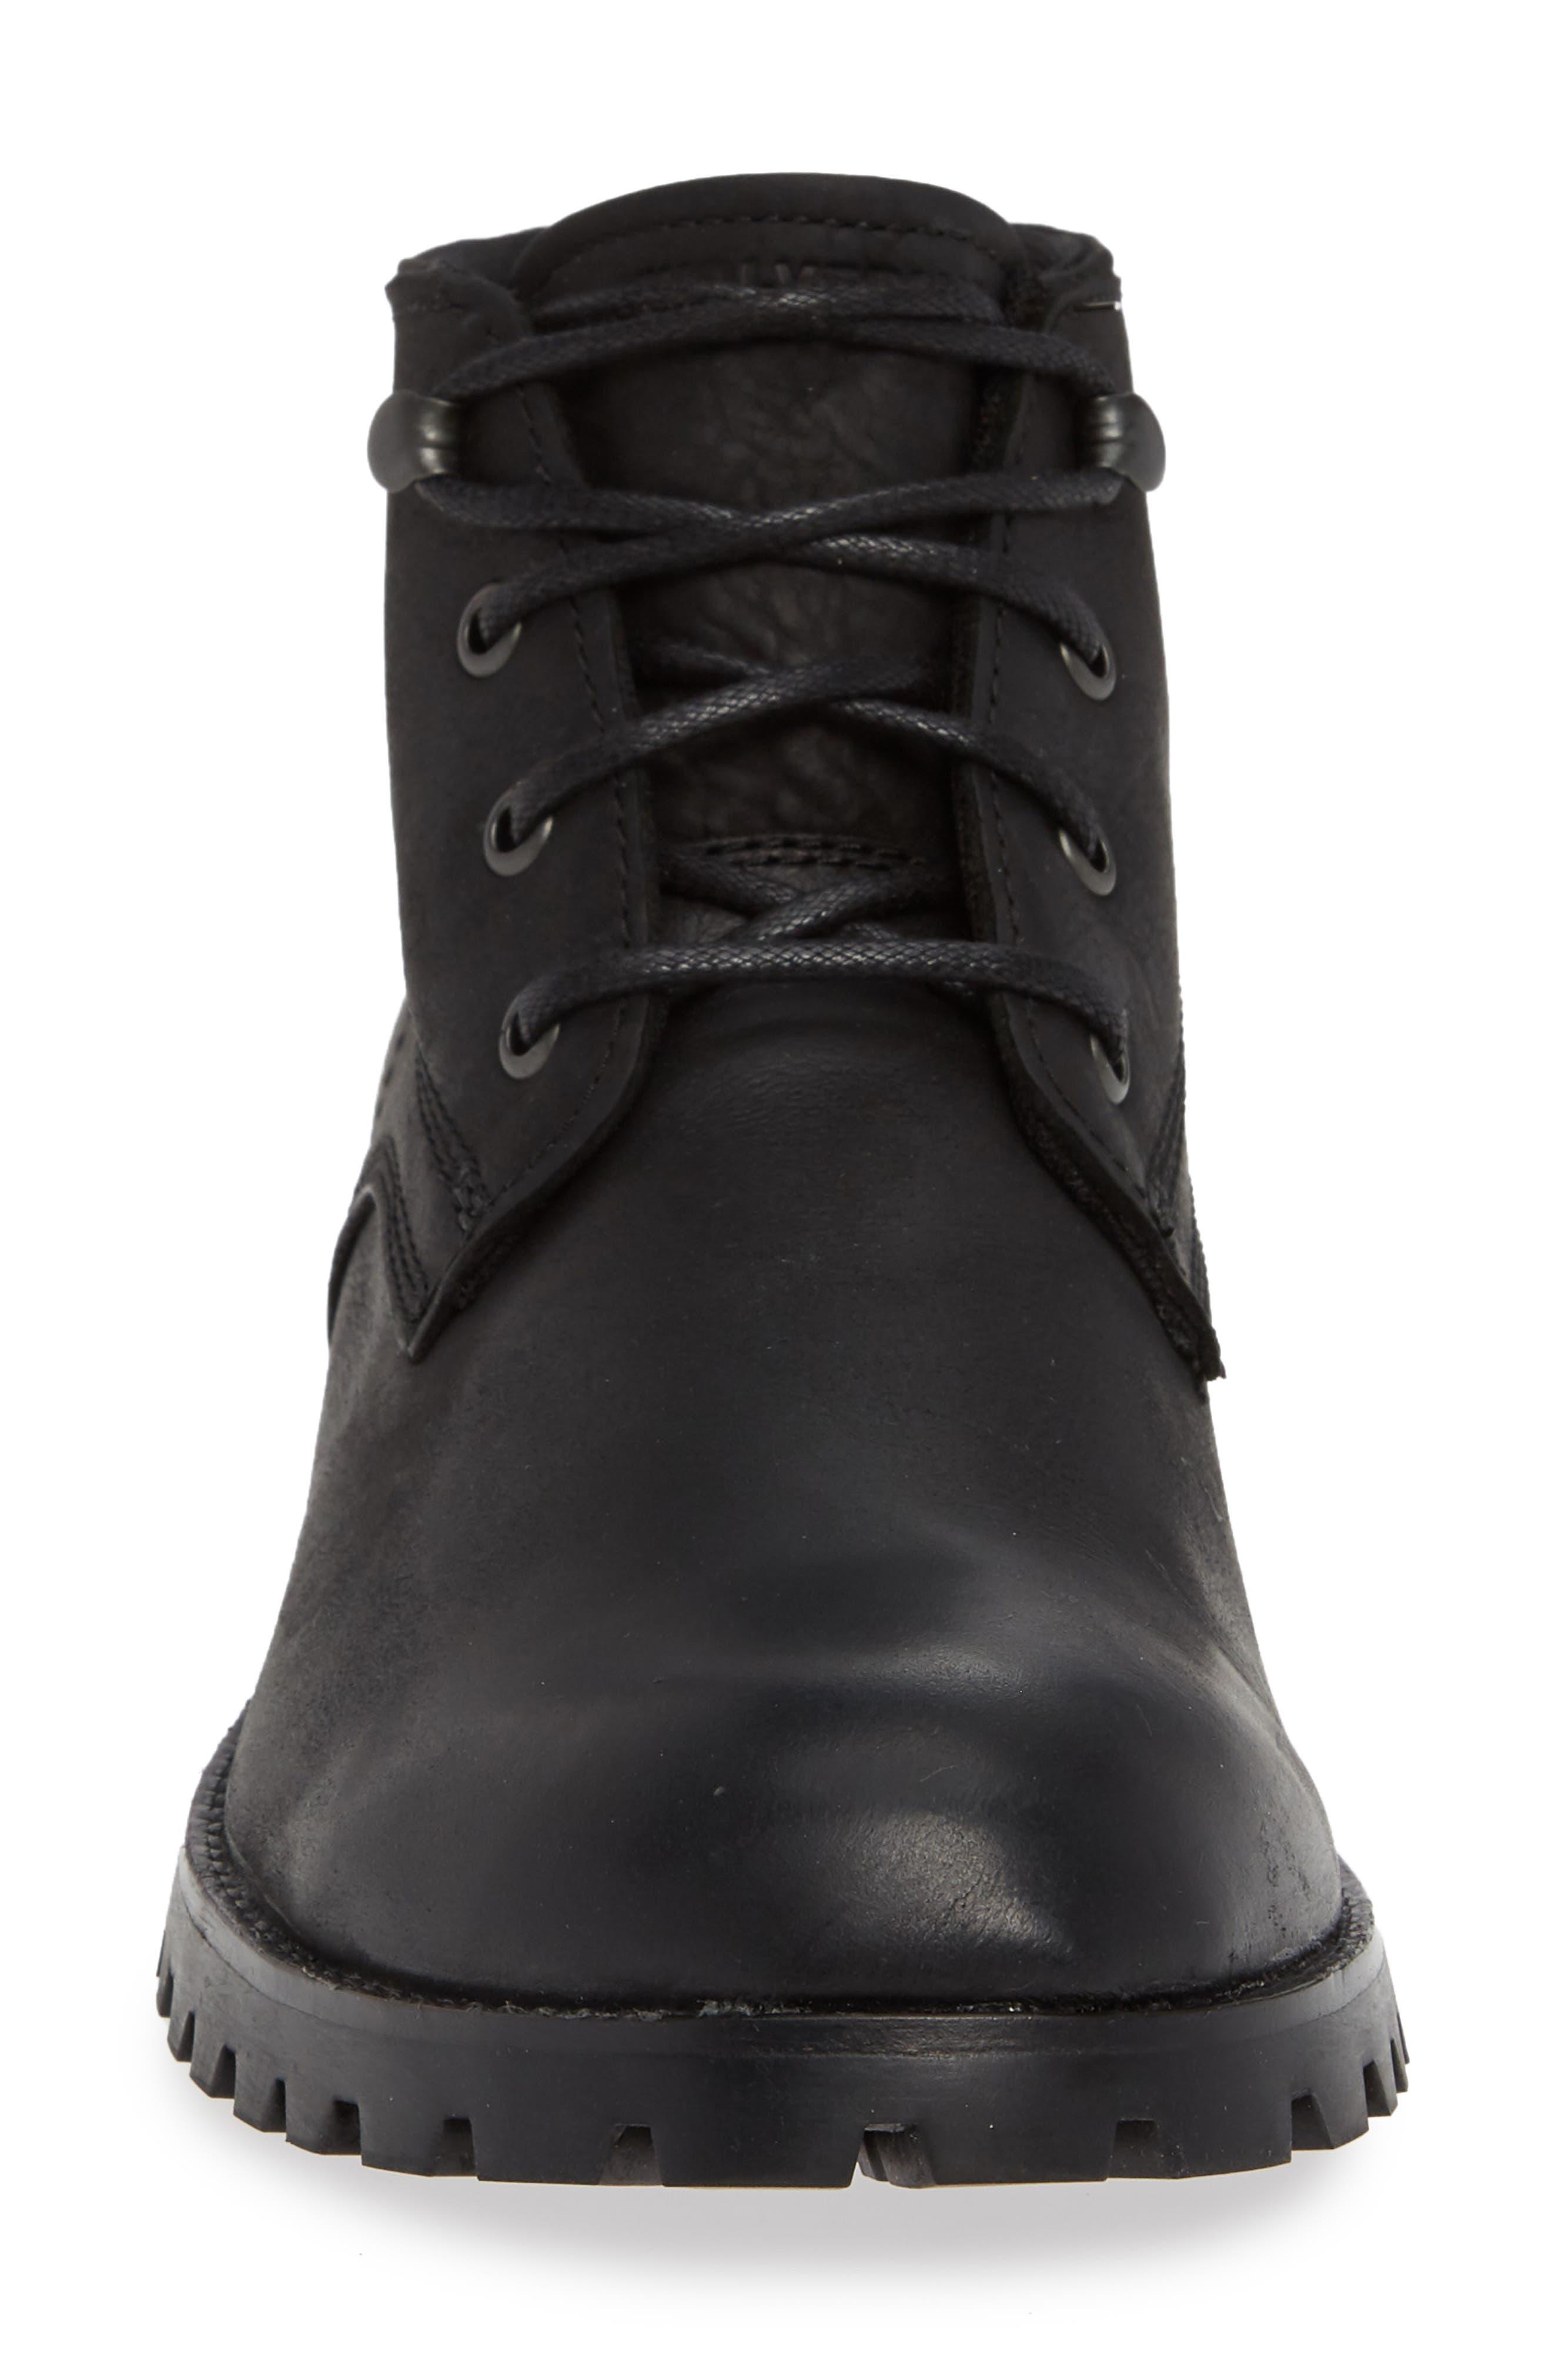 WOLVERINE,                             Cort Plain Toe Waterproof Boot,                             Alternate thumbnail 4, color,                             MEDIUM BLACK